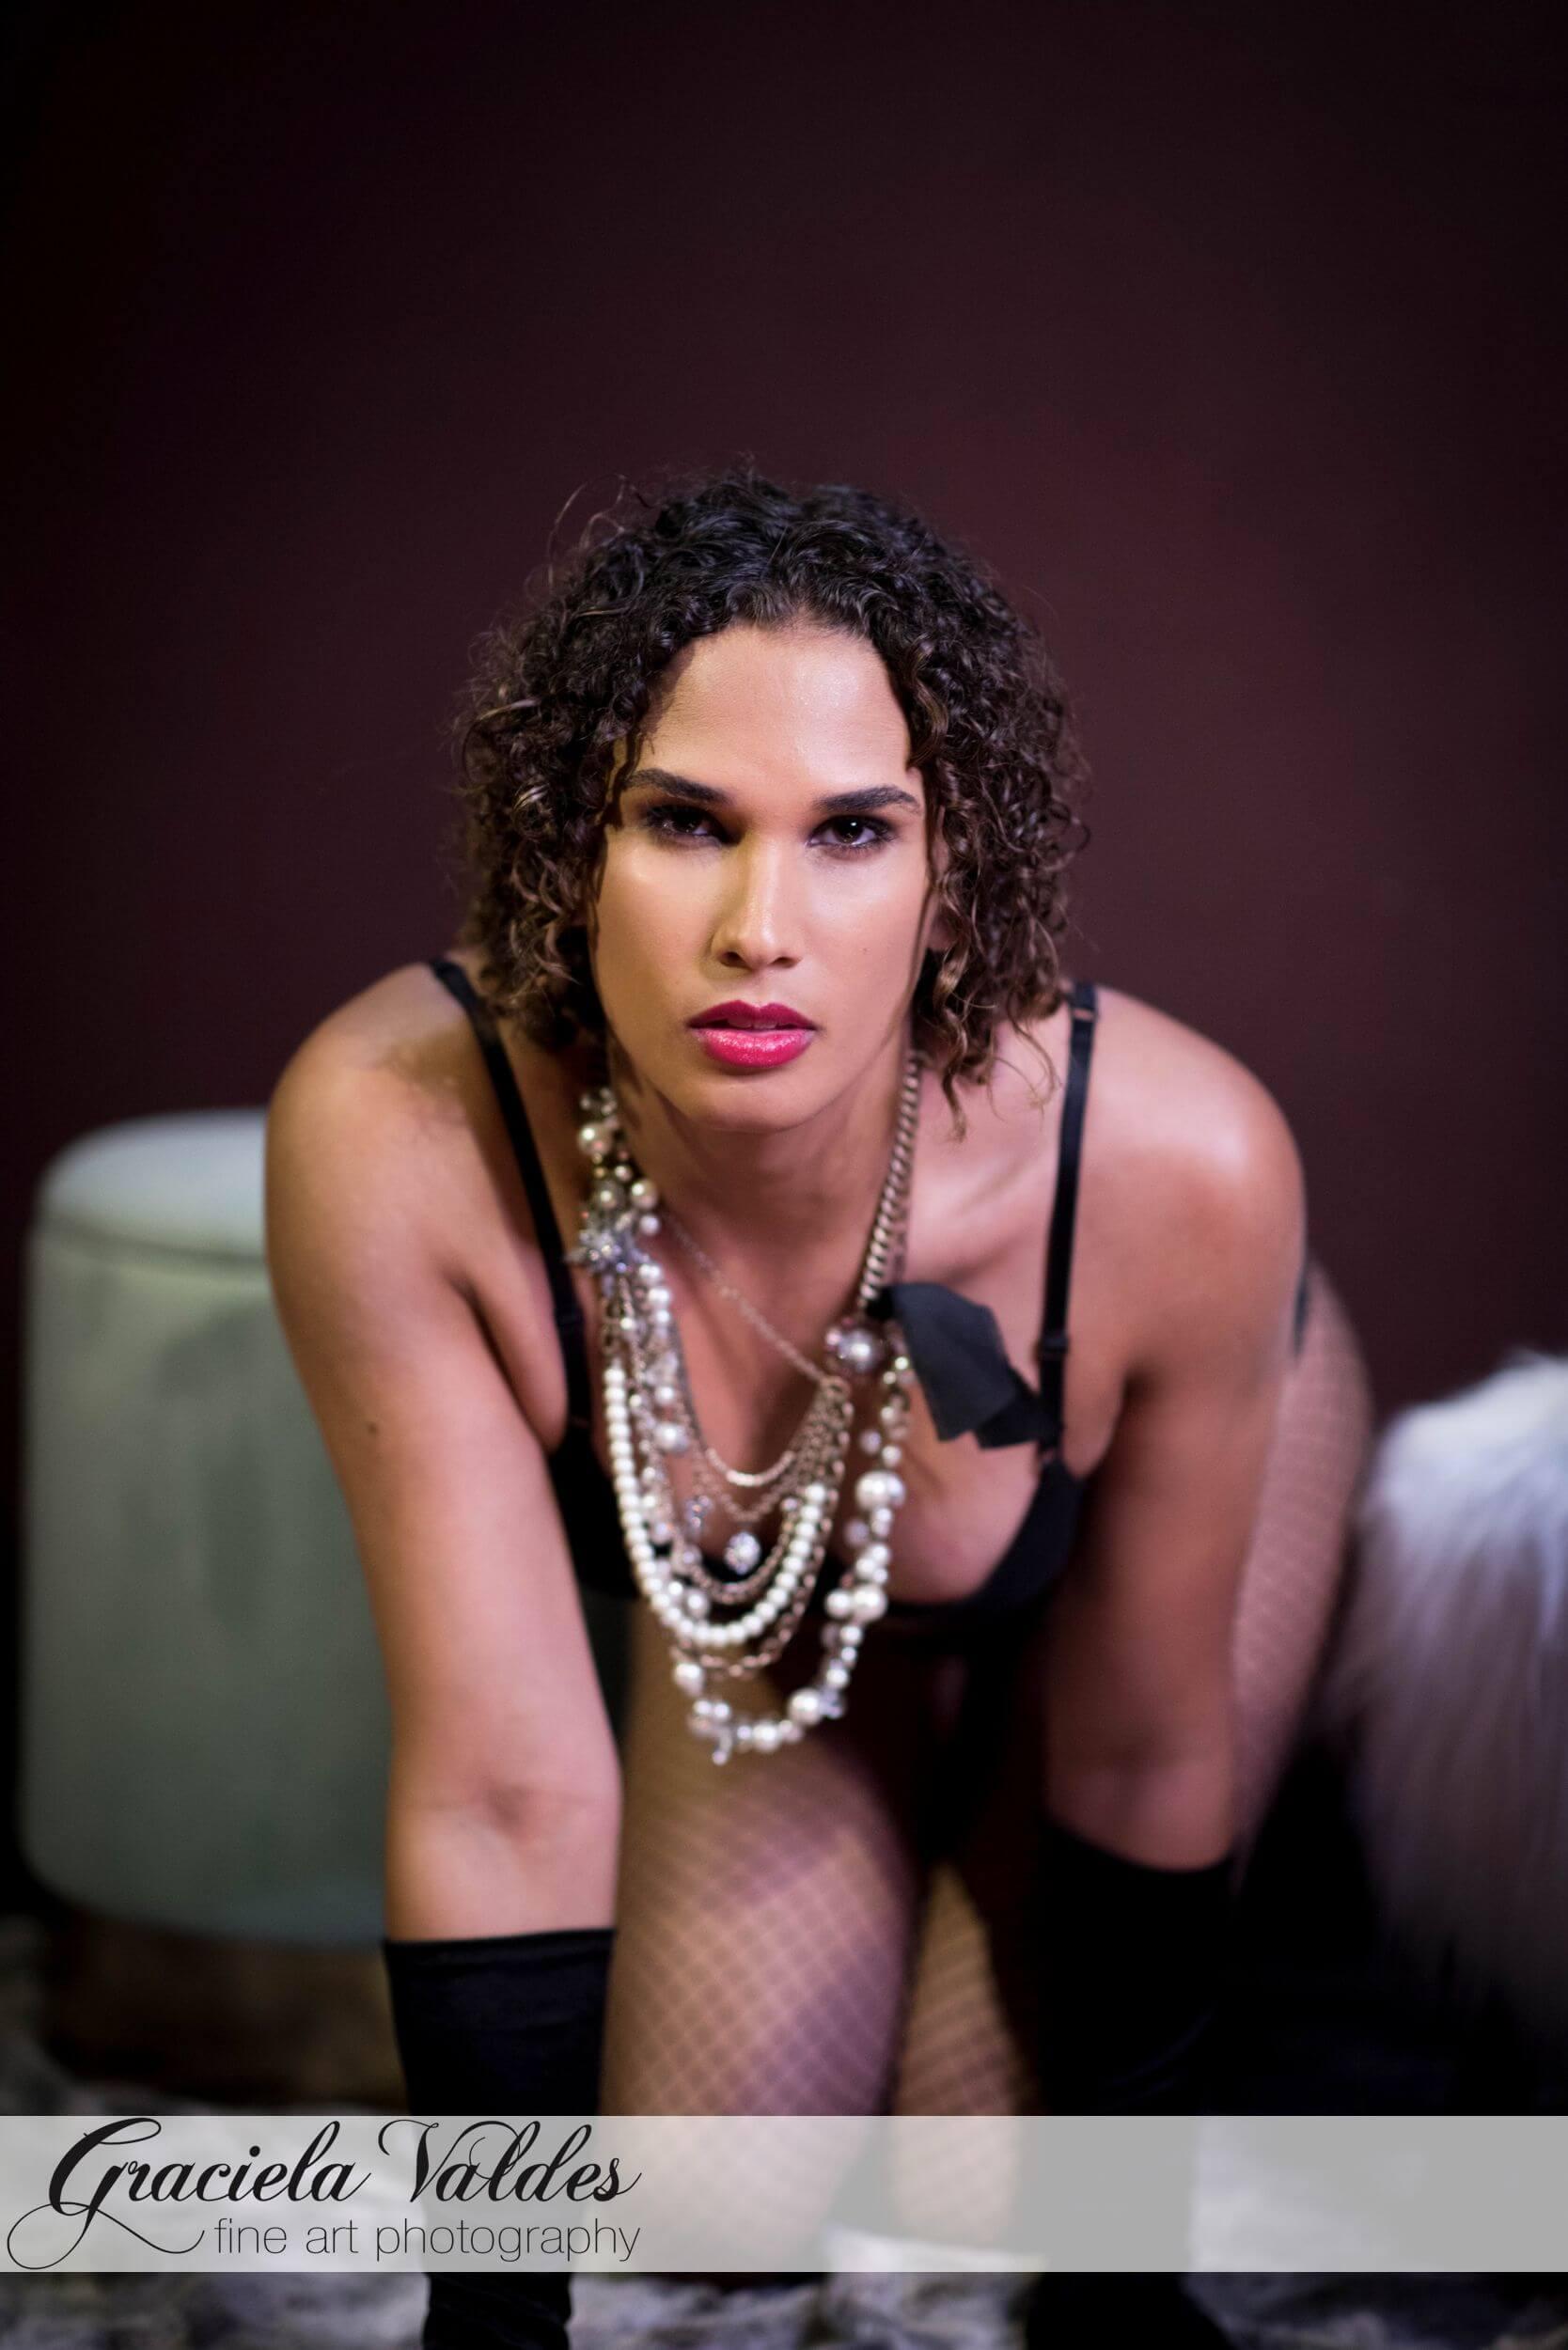 Sex After Dark by Graciela Valdes 73.jpg